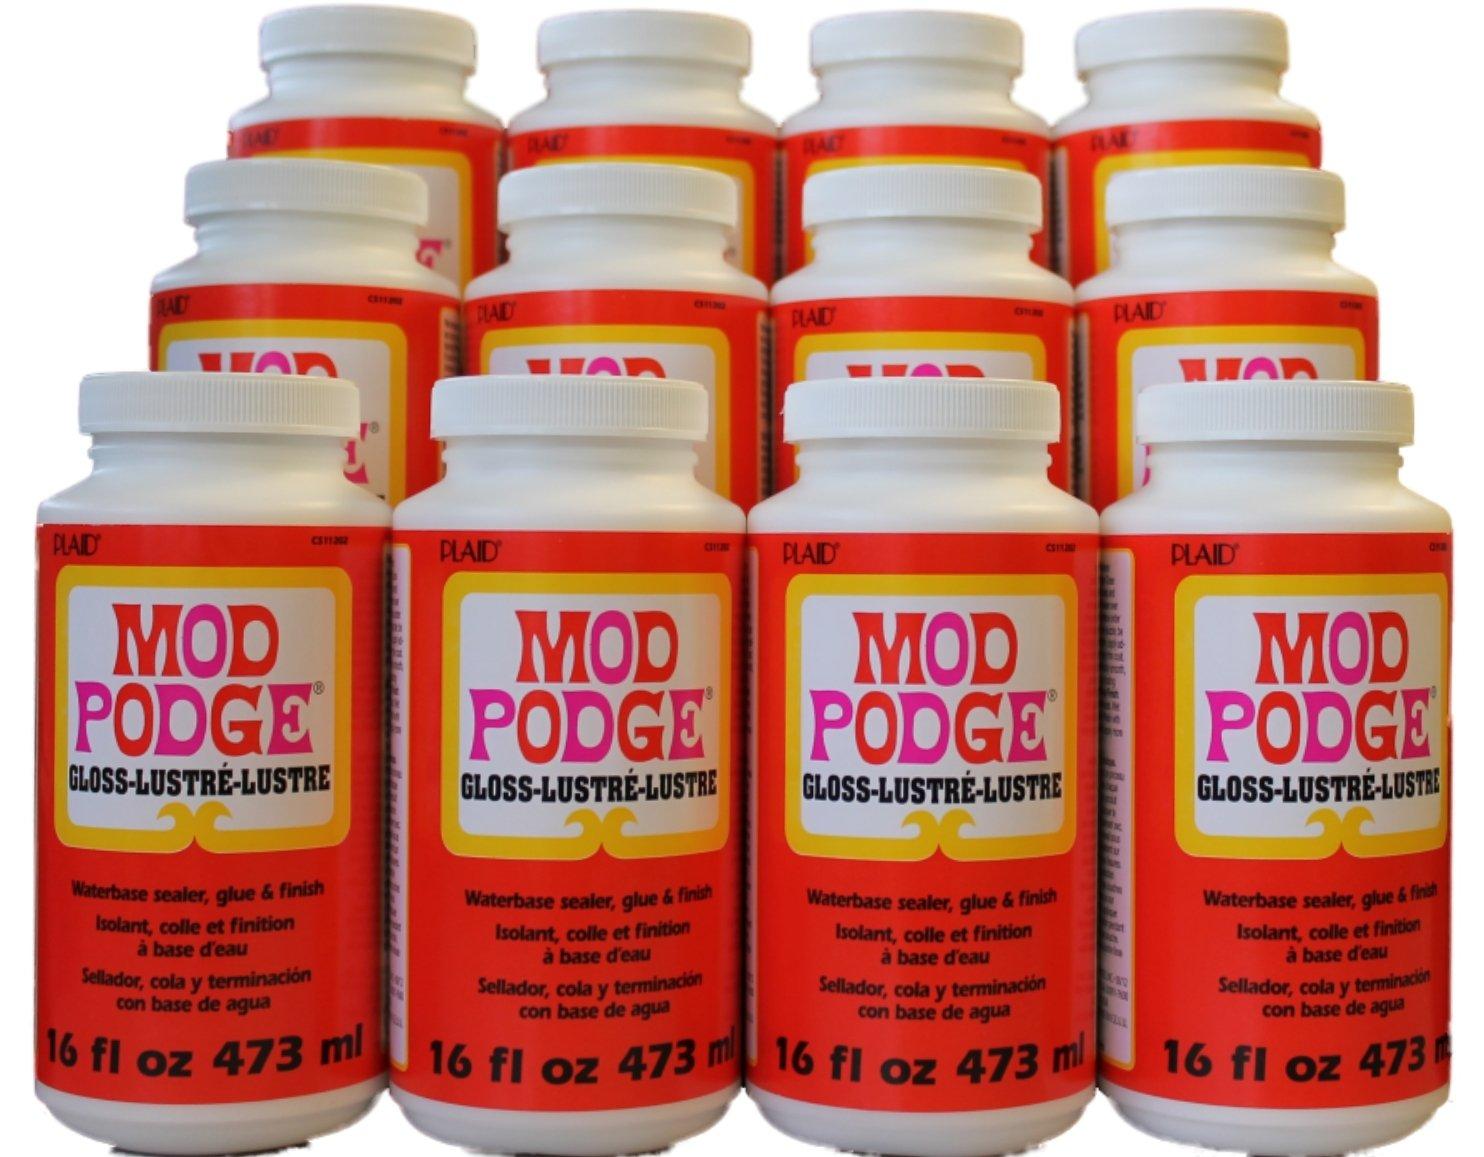 MOD PODGE All-In-One Gloss Glue, Sealer & Finish (Set of 12), 16 oz Plaid Enterprises Inc. AMZCS11202